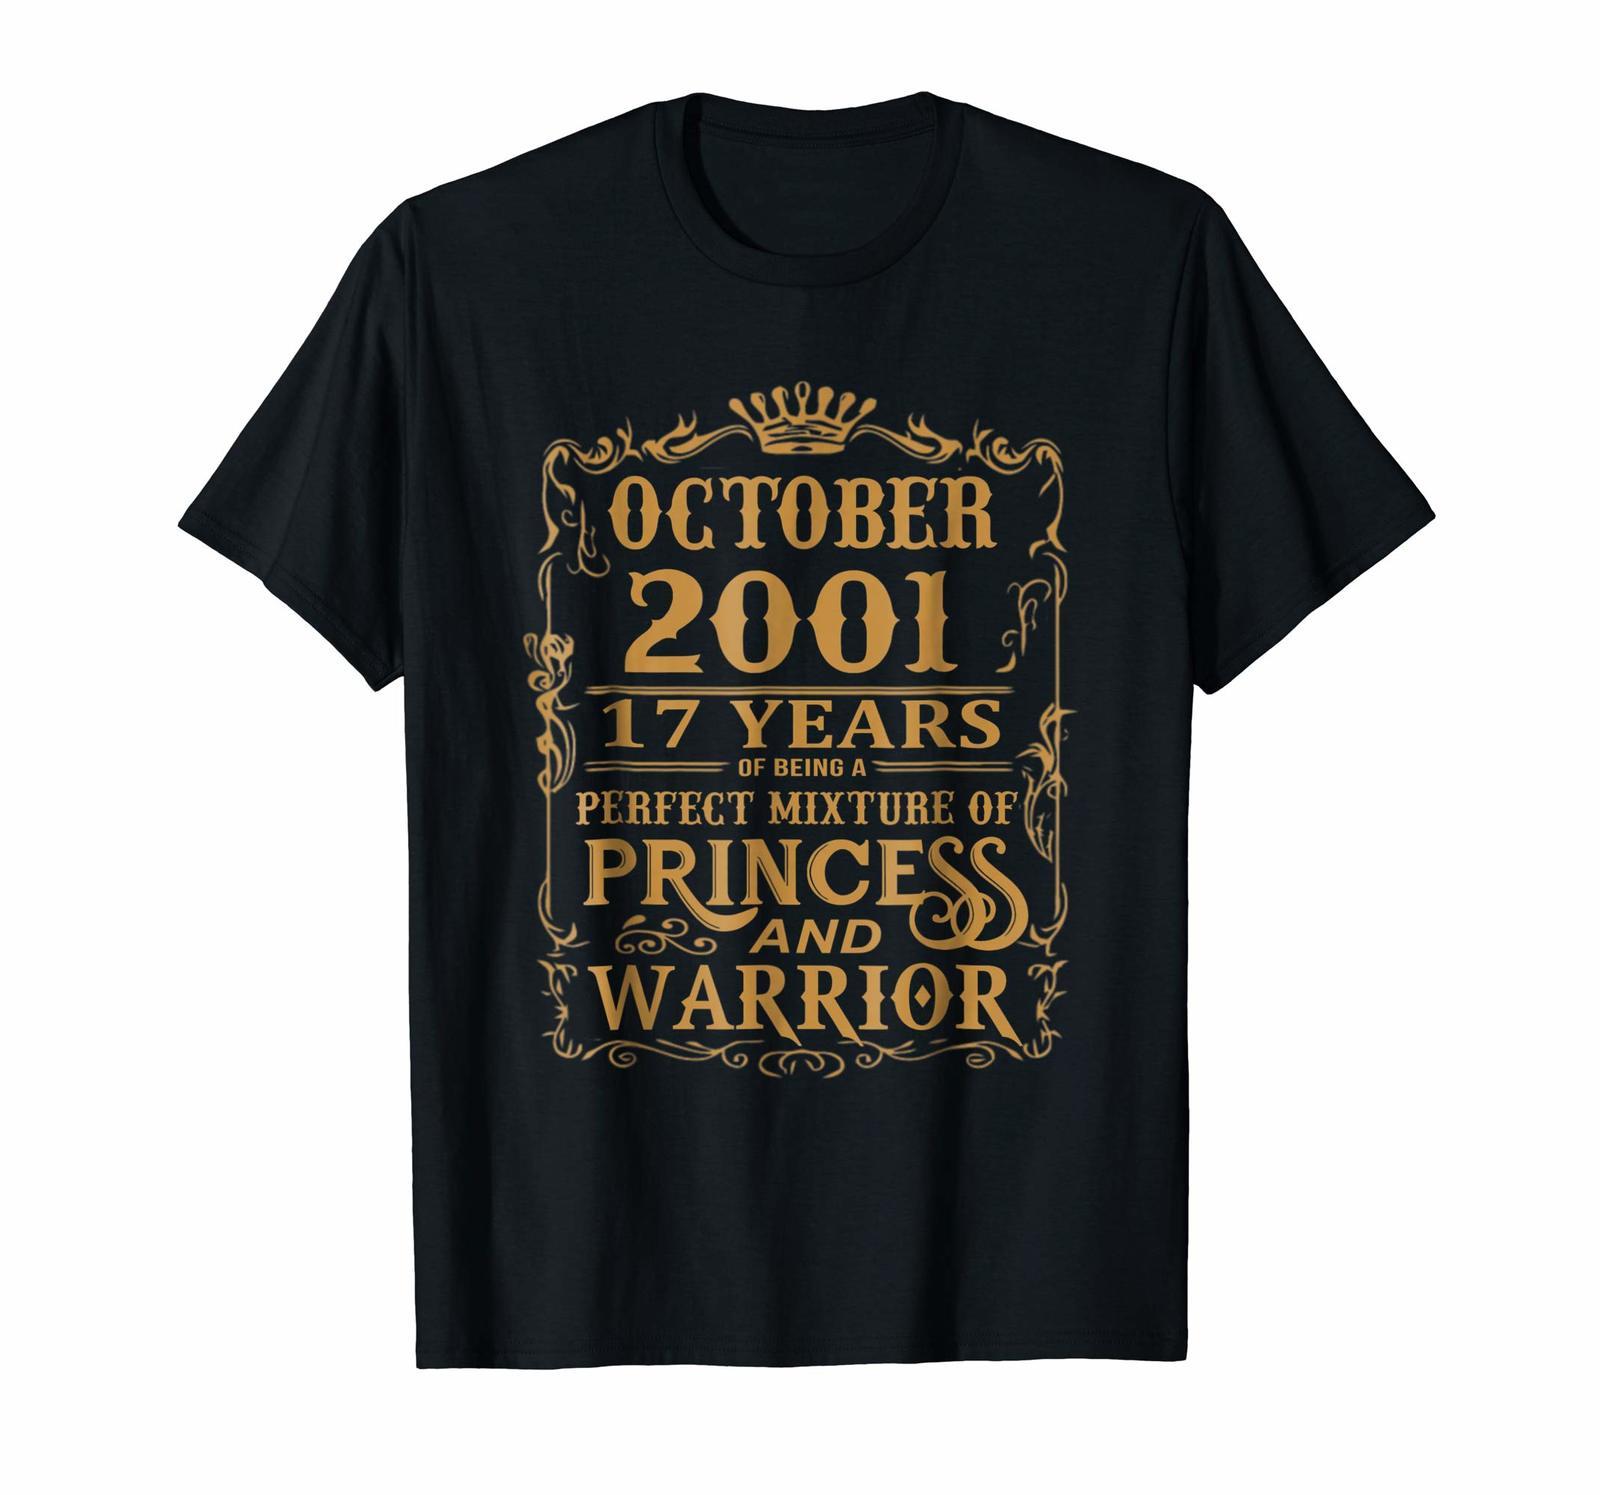 Uncle Shirts -   October 2001 A Perfect Mixture Of Princess And Warrior Shirt Me